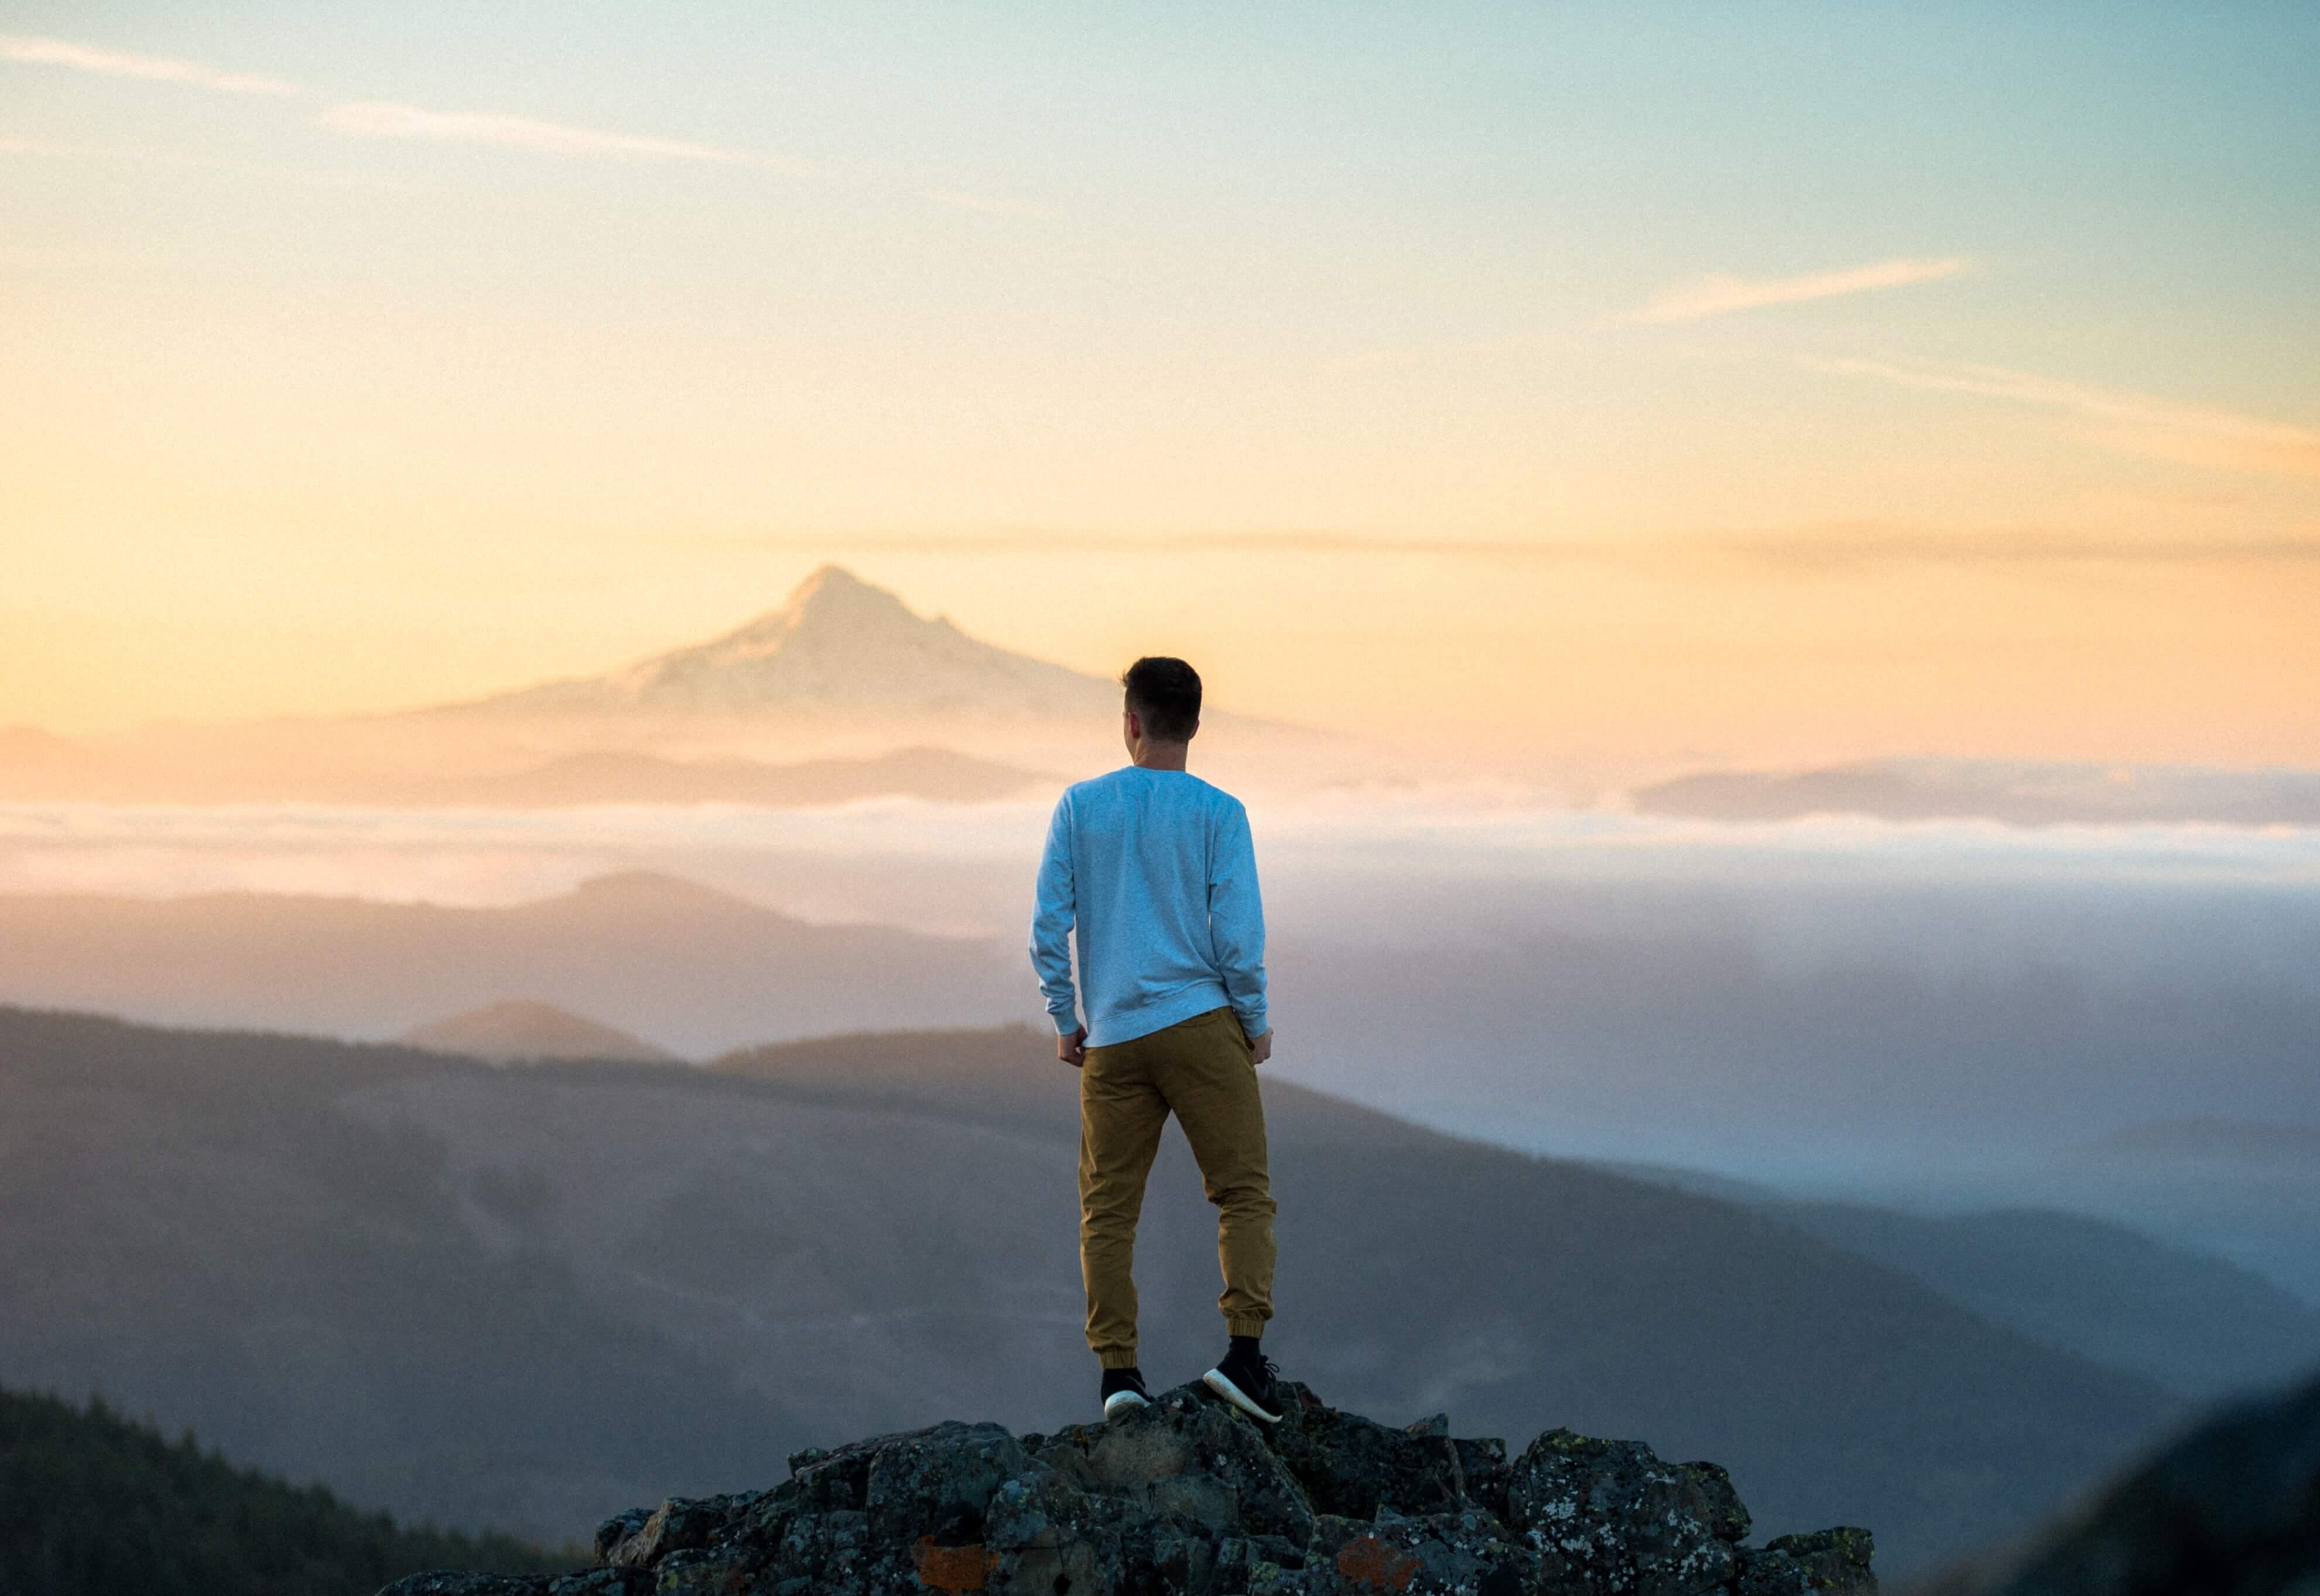 Man stood on top of mountain